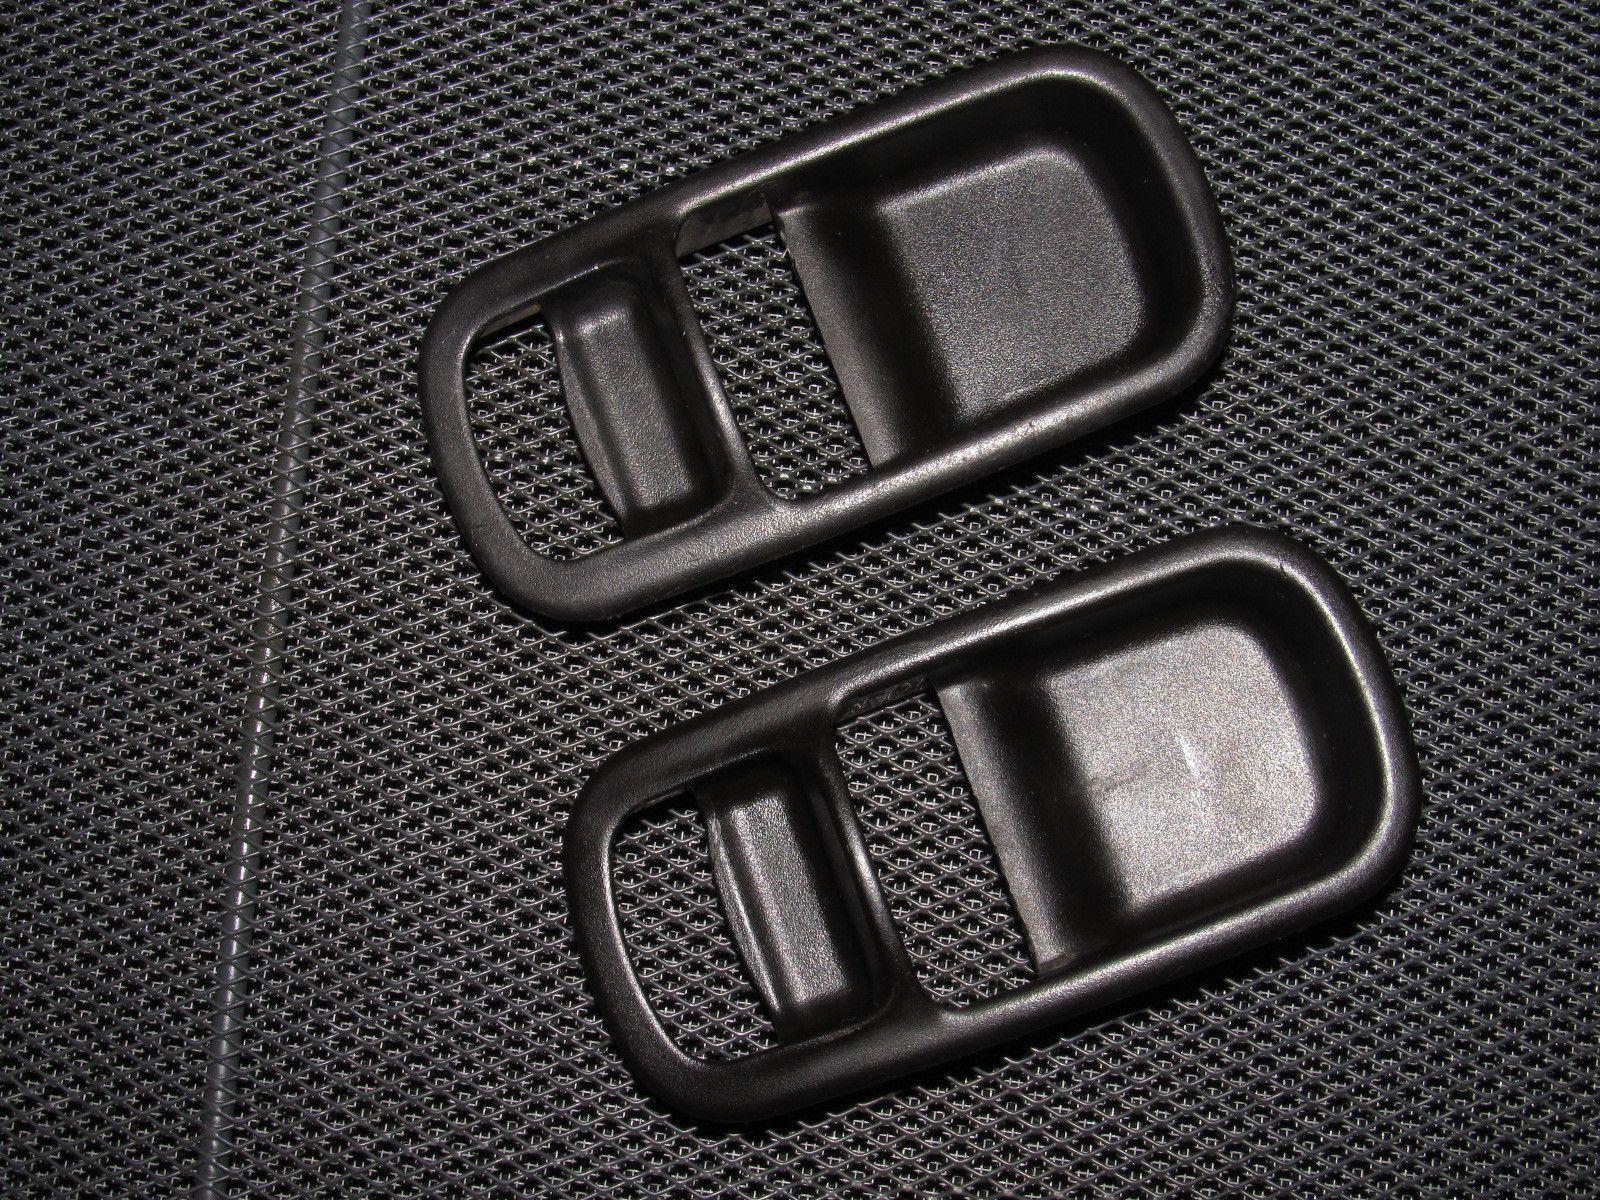 89 90 91 92 93 94 nissan 240sx oem interior handle bezel trim  89 90 91 92 93 94 nissan 240sx oem interior handle bezel trim black